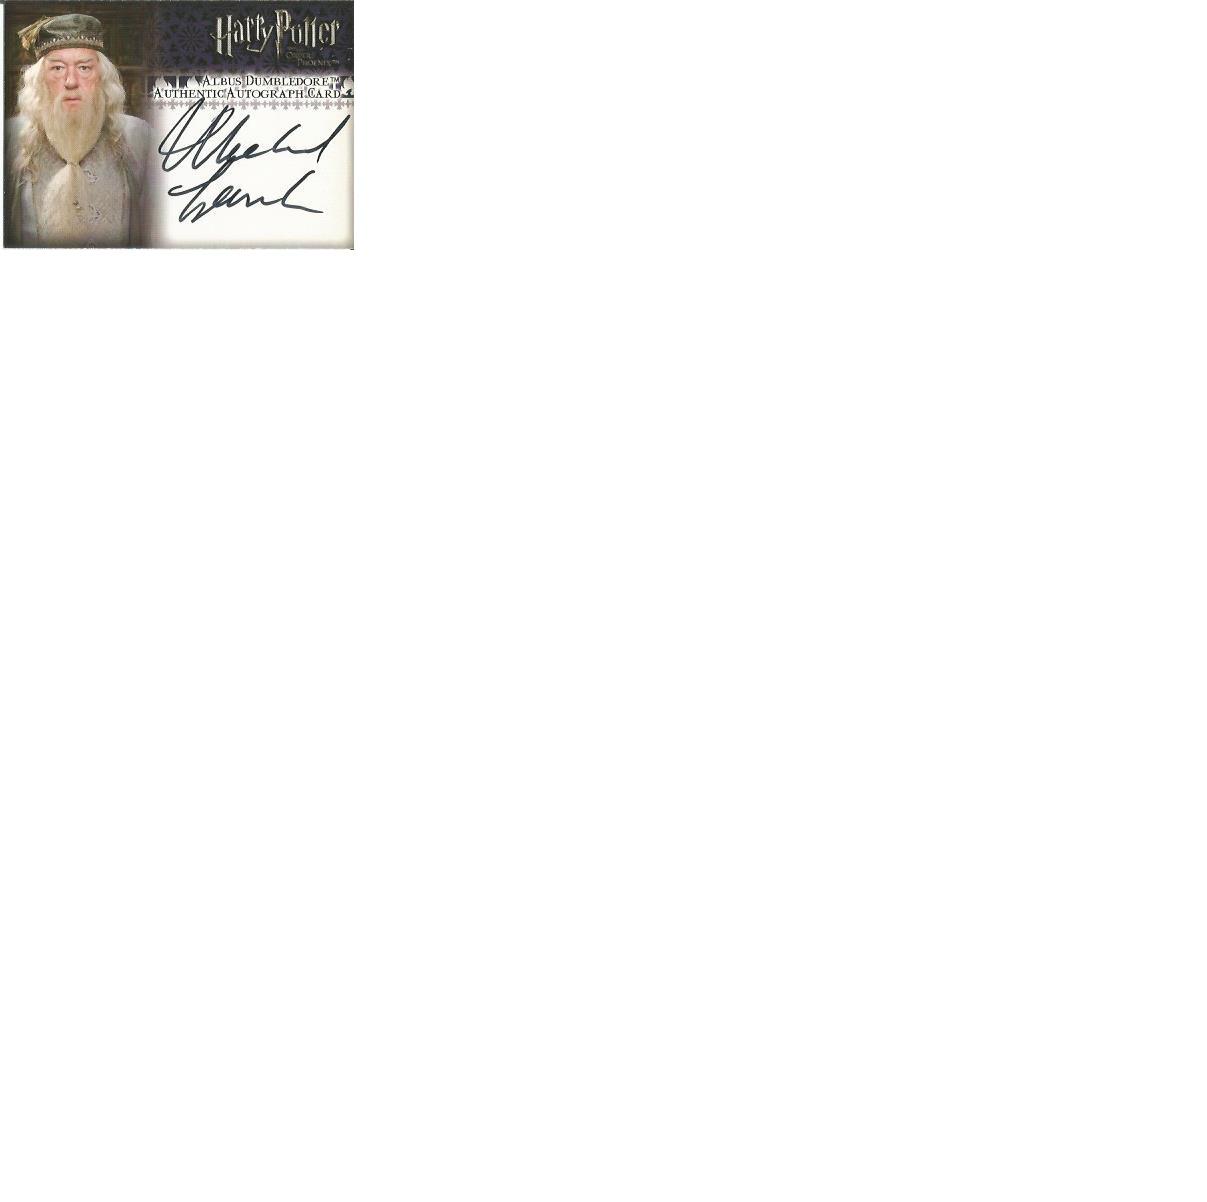 Lot 57 - Michael Gambon as Albus Dumbledore signed Harry Potter Order of the Phoenix autographed Artbox